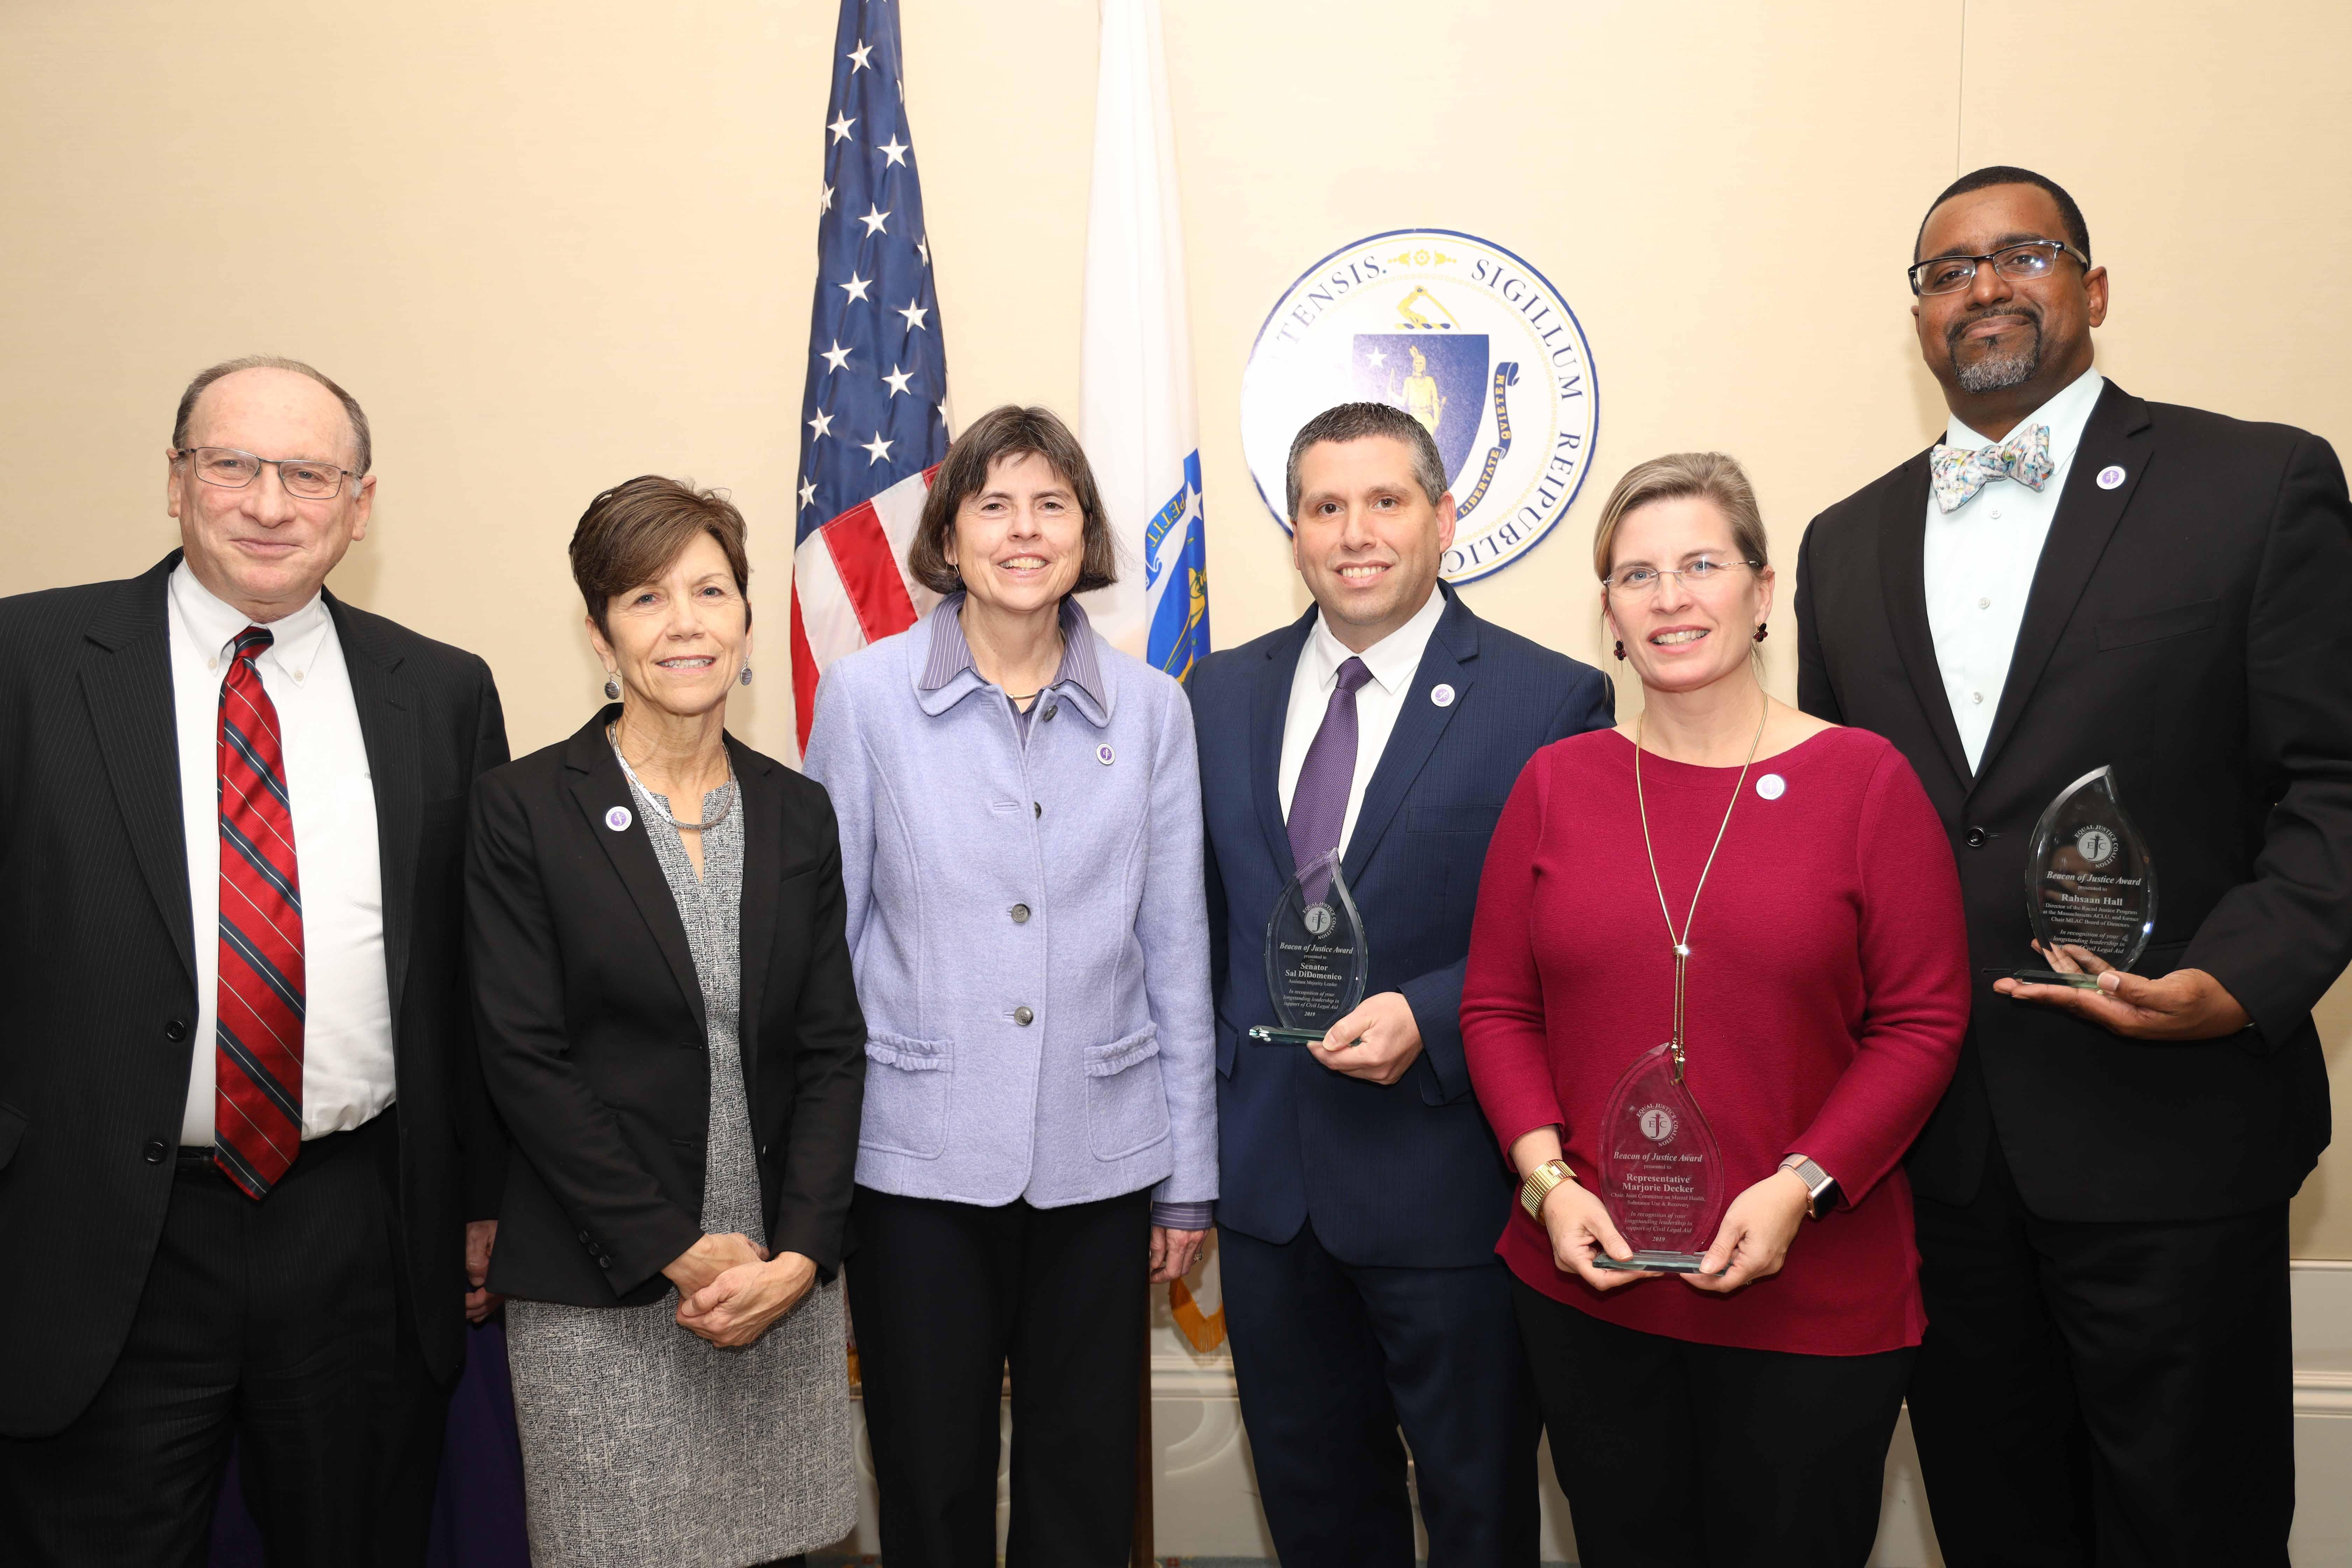 Chief Justice Ralph Gants, Lynne Parker, Marijane Benner Browne, Sen. Sal DiDomenico, Rep. Marjorie Decker, Rahsaan Hall